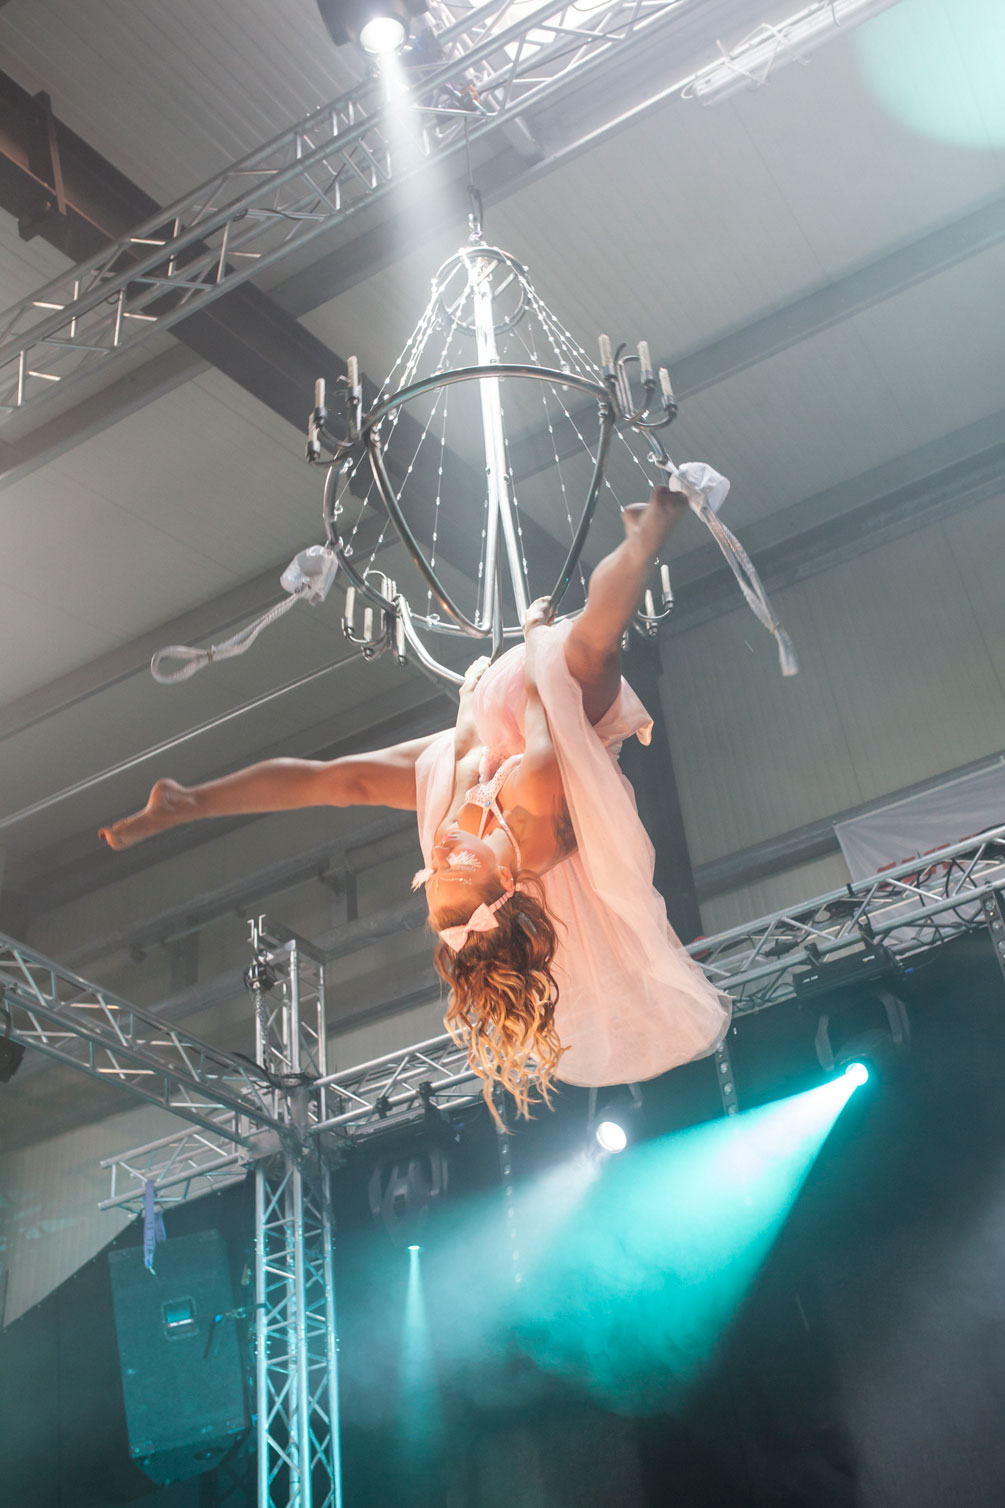 Kronleuchter-aAkrobatik - Flying Chandelier